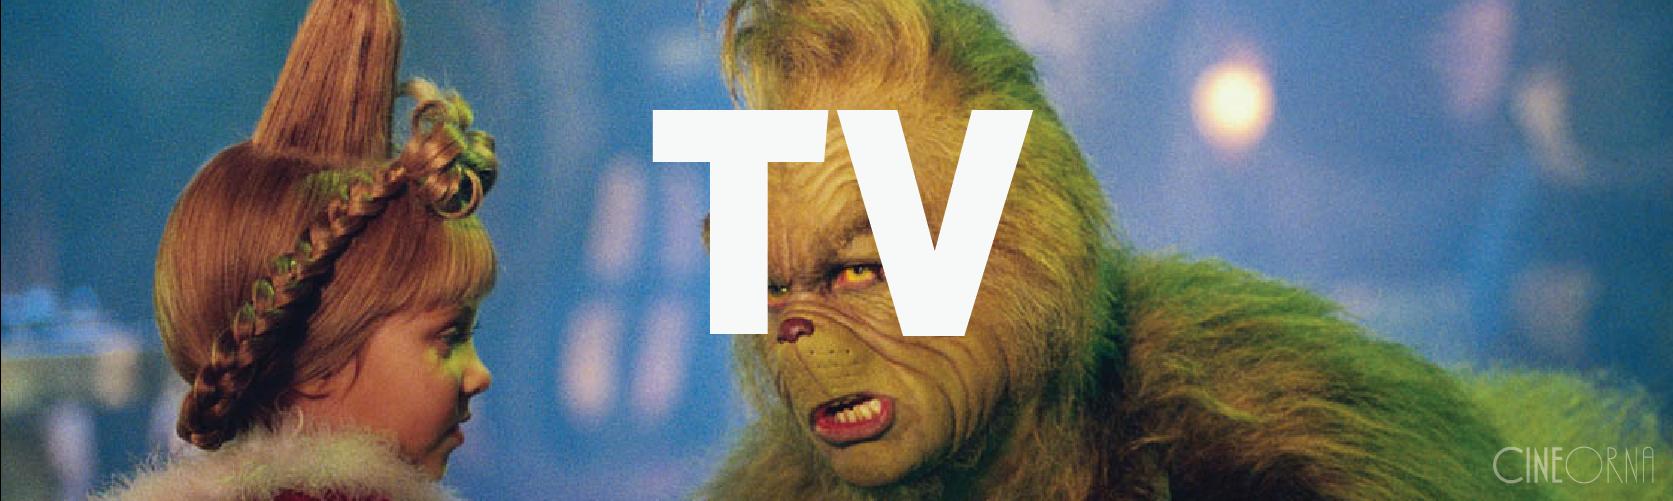 Jim Carrey é a estrela do Natal do Telecine Fun